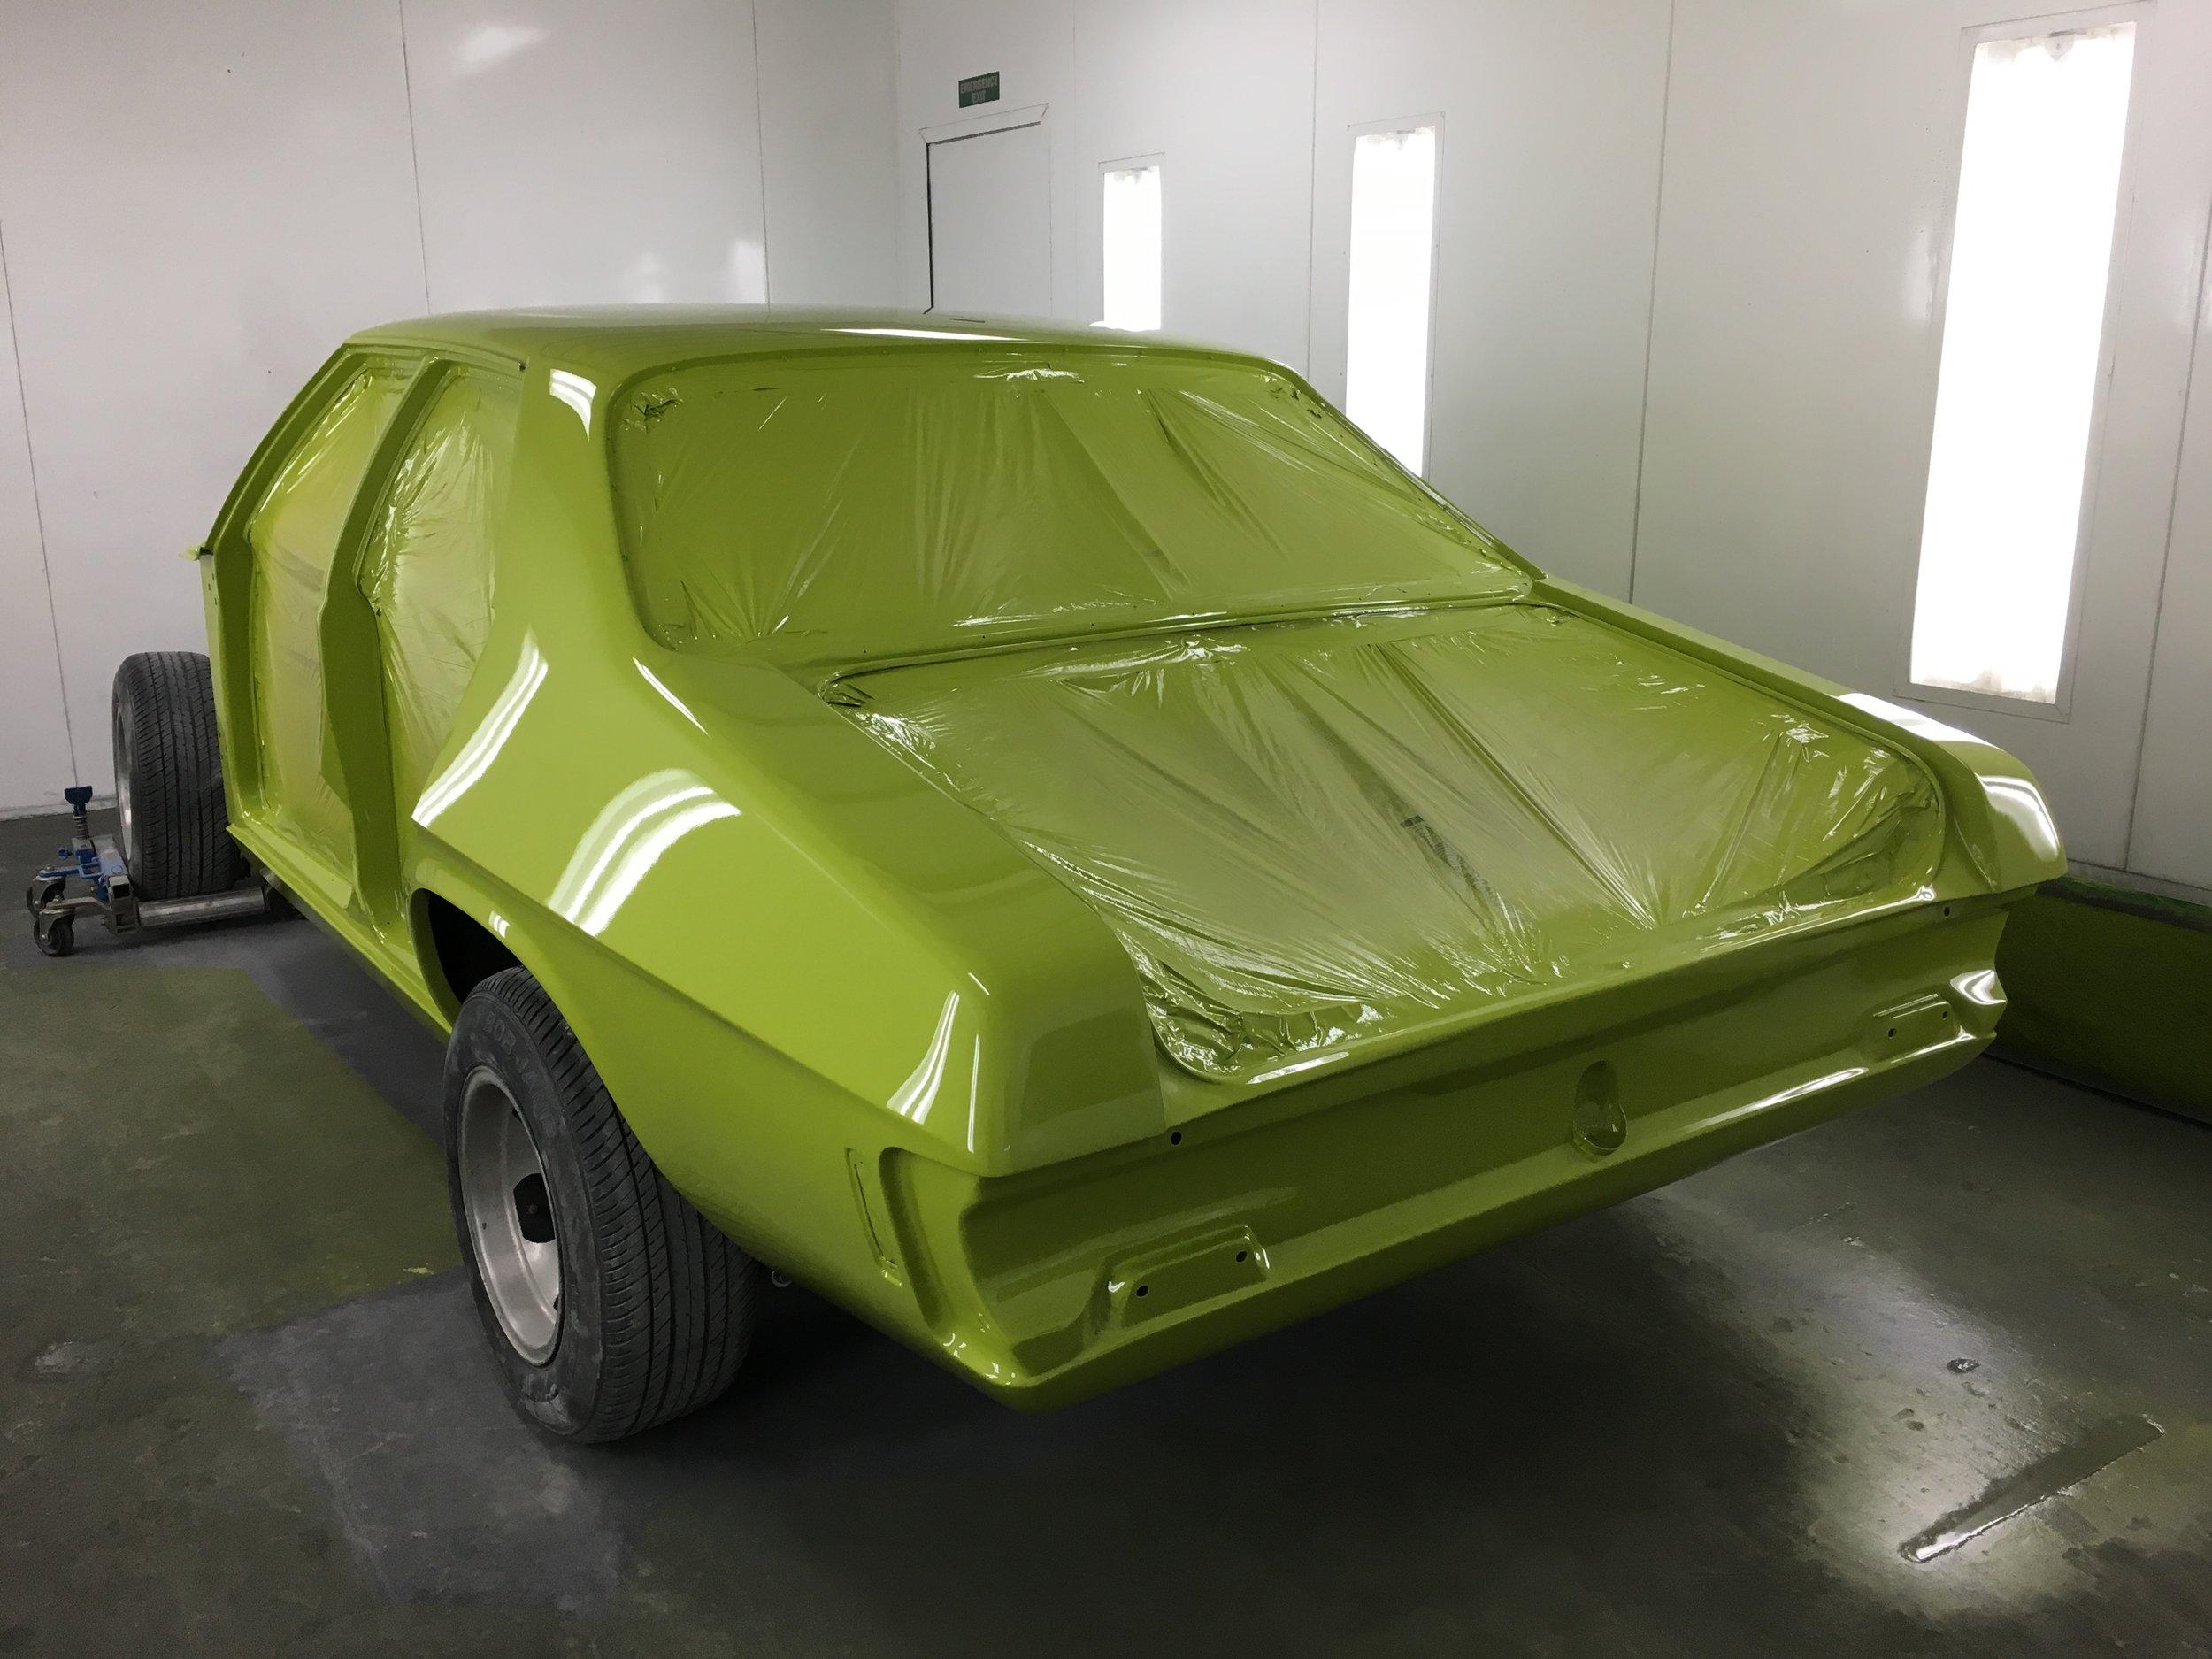 Holden HQ Lettuce Alone Green - Restoration Bare metal Brisbane (66).JPG